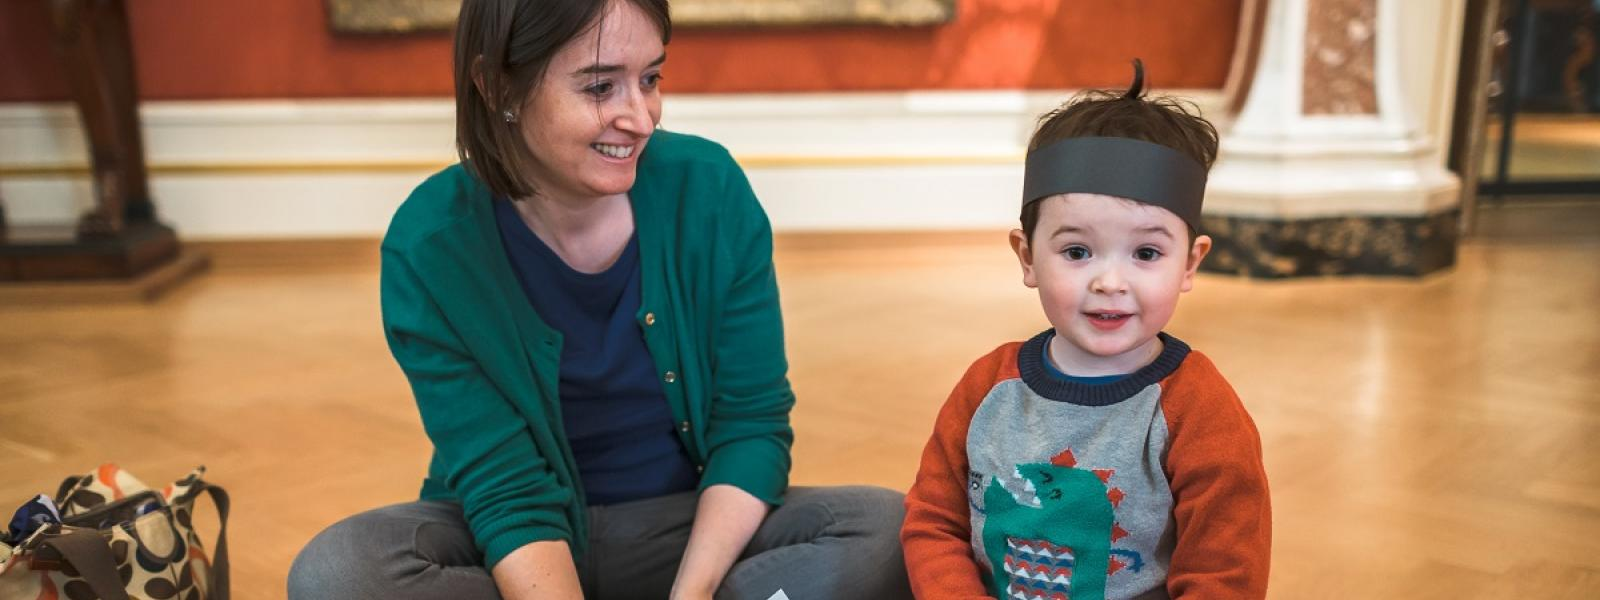 Family craft activities at the Ashmolean